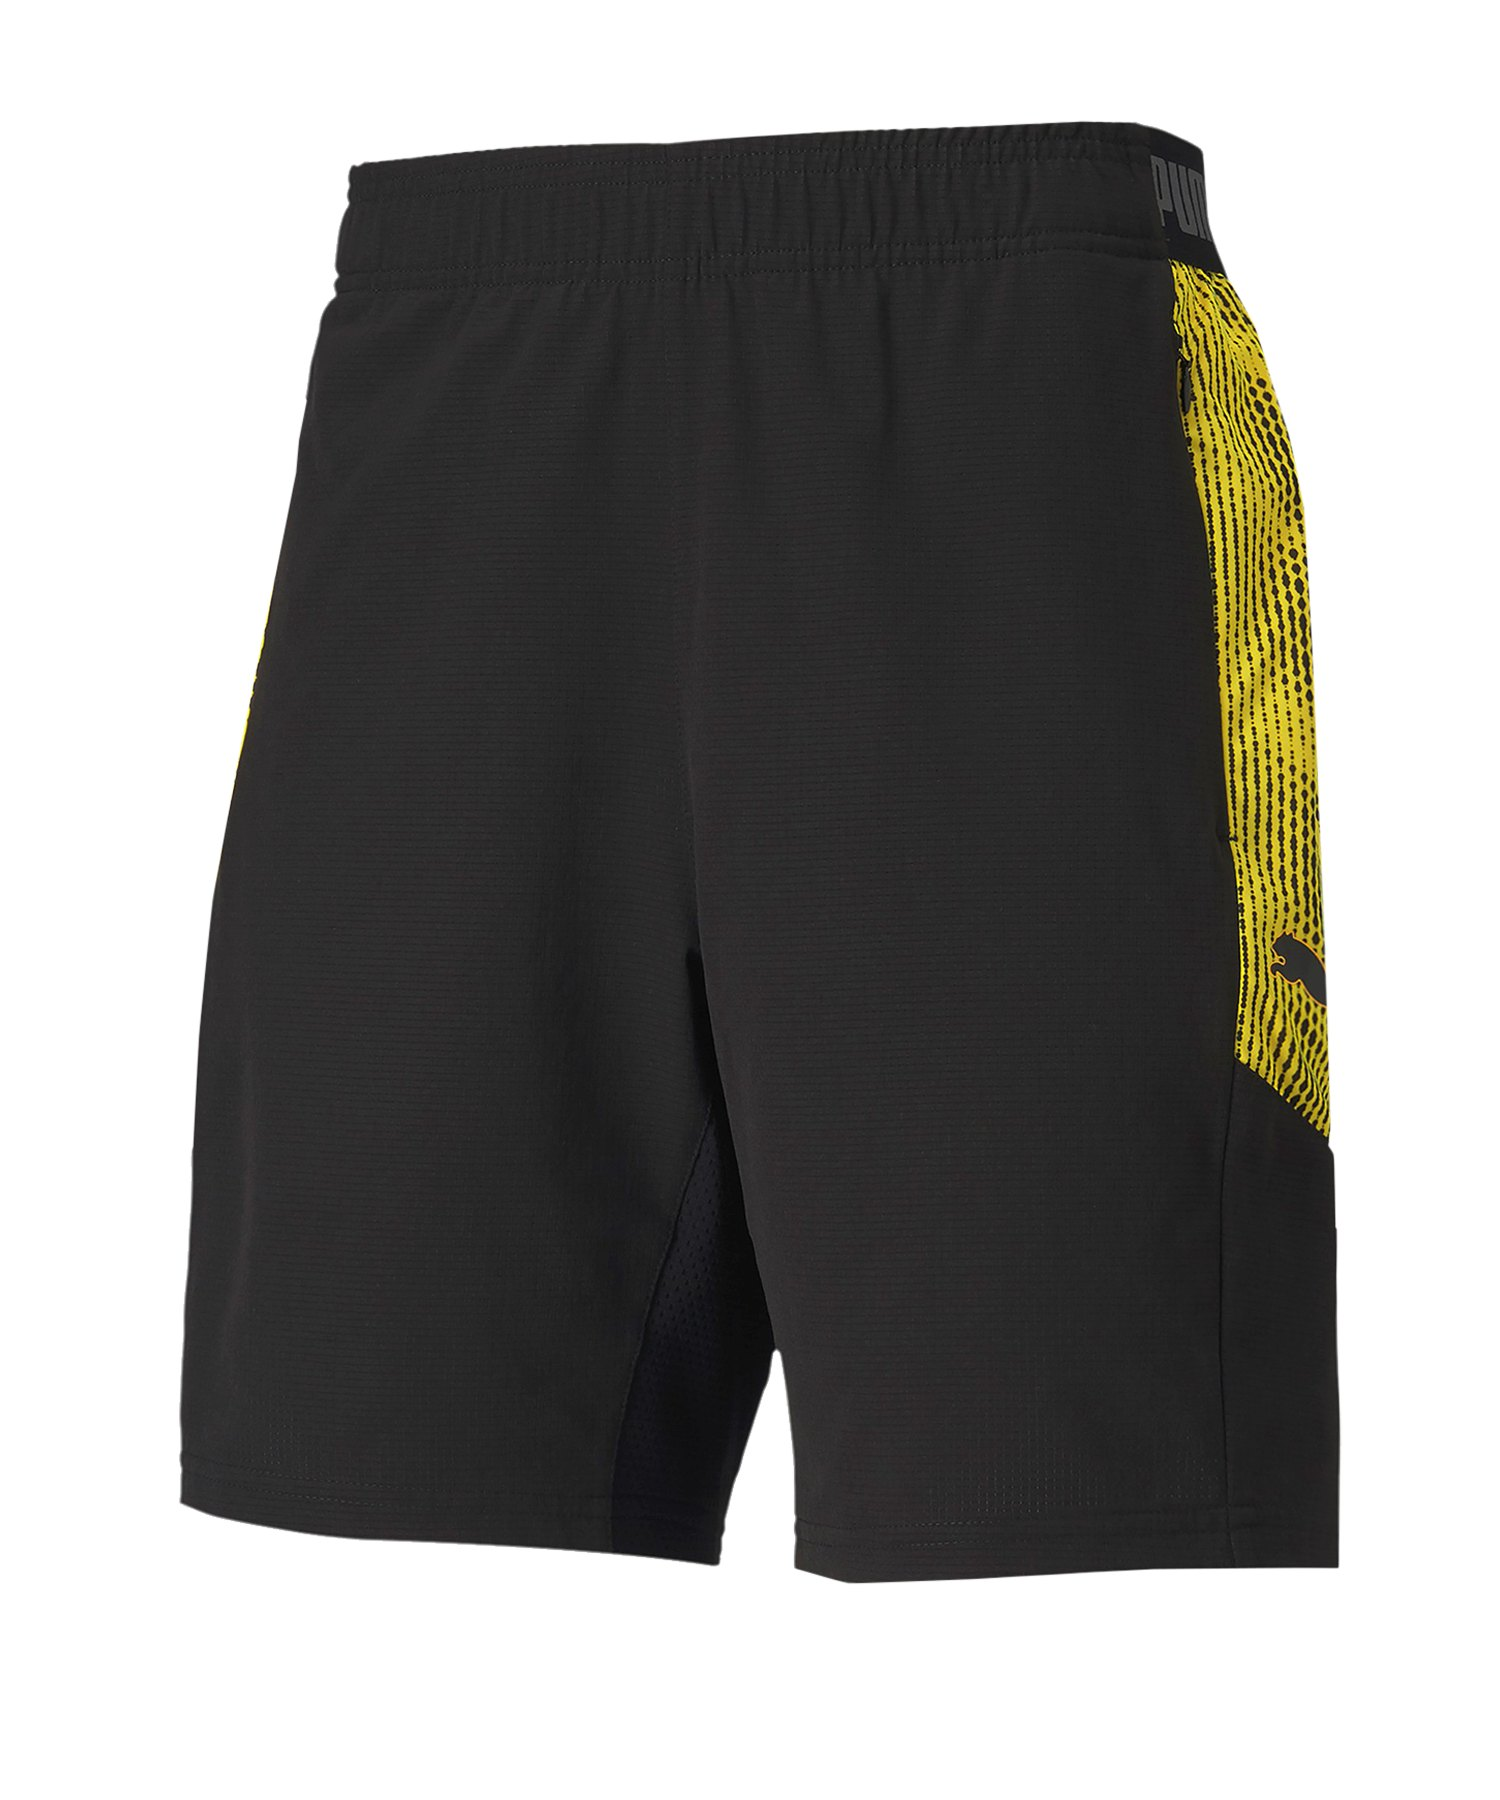 PUMA ftblNXT Pro Short Schwarz Gelb F04 - schwarz